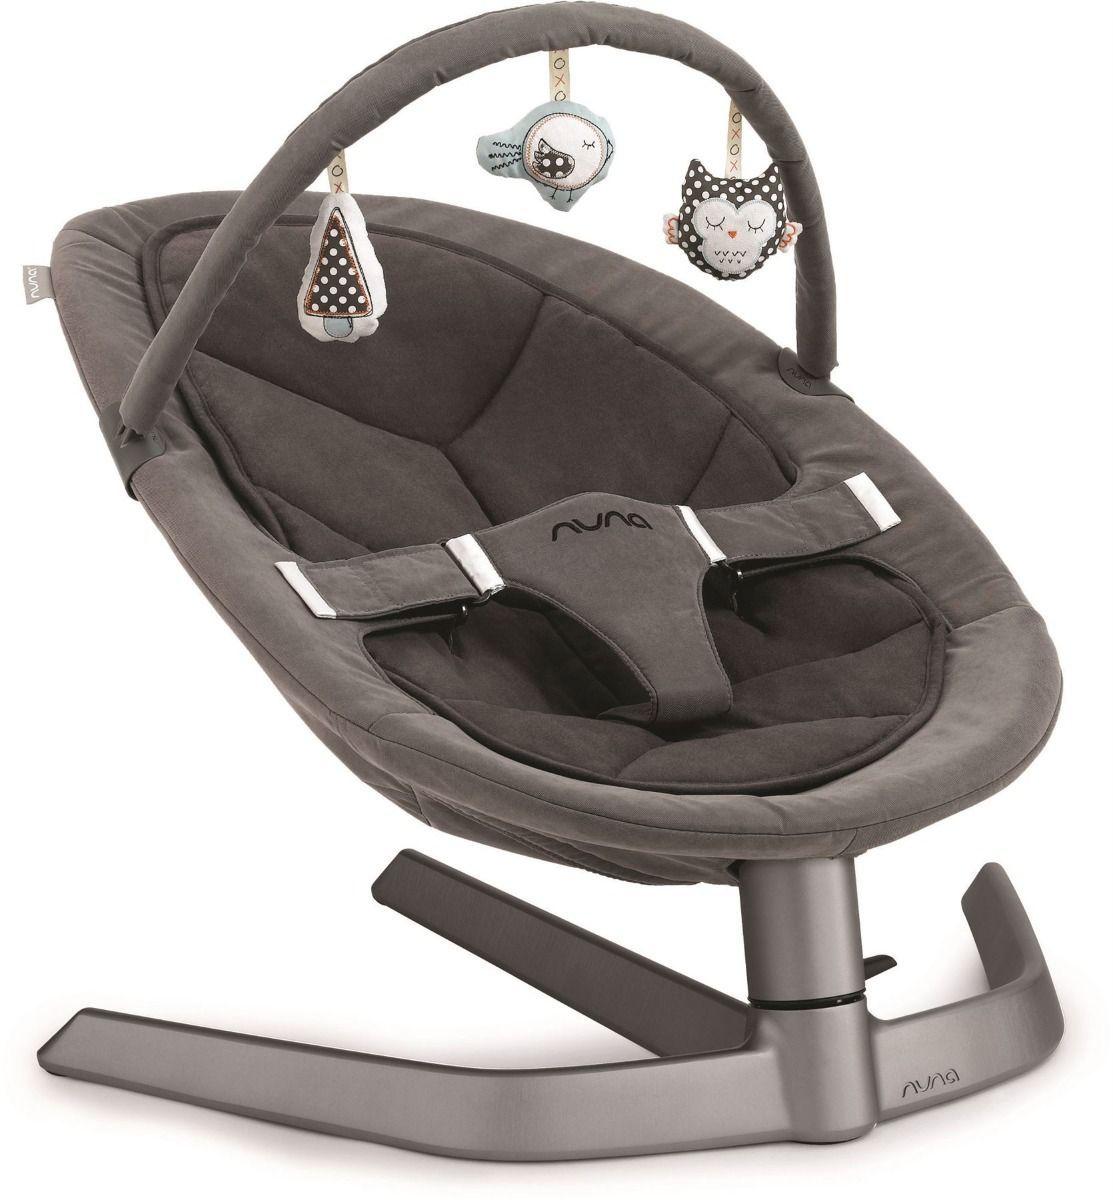 Nuna Leaf Rocker Cinder en 2020 Car seat, Mobilier de